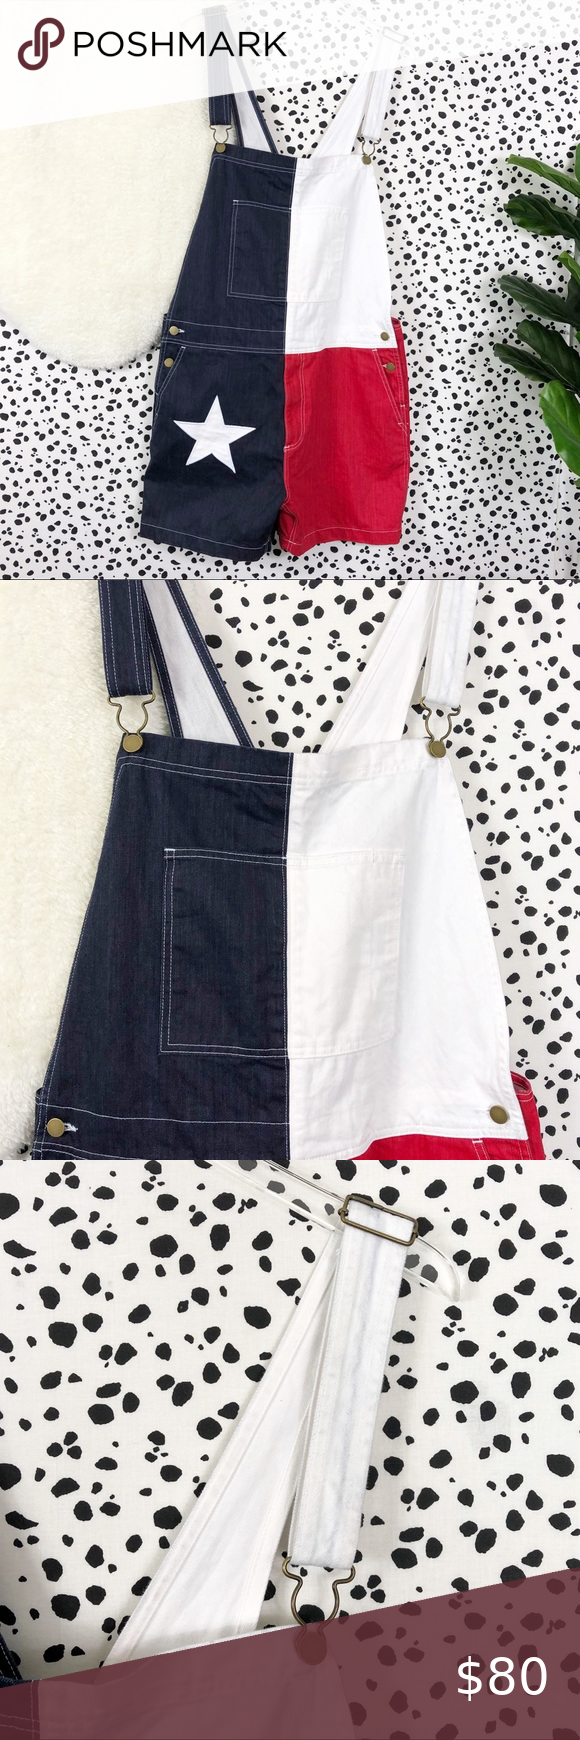 Chubbies Men S Texas Flag Denim Chubberalls Xl In 2020 Clothes Design Overall Shorts Denim